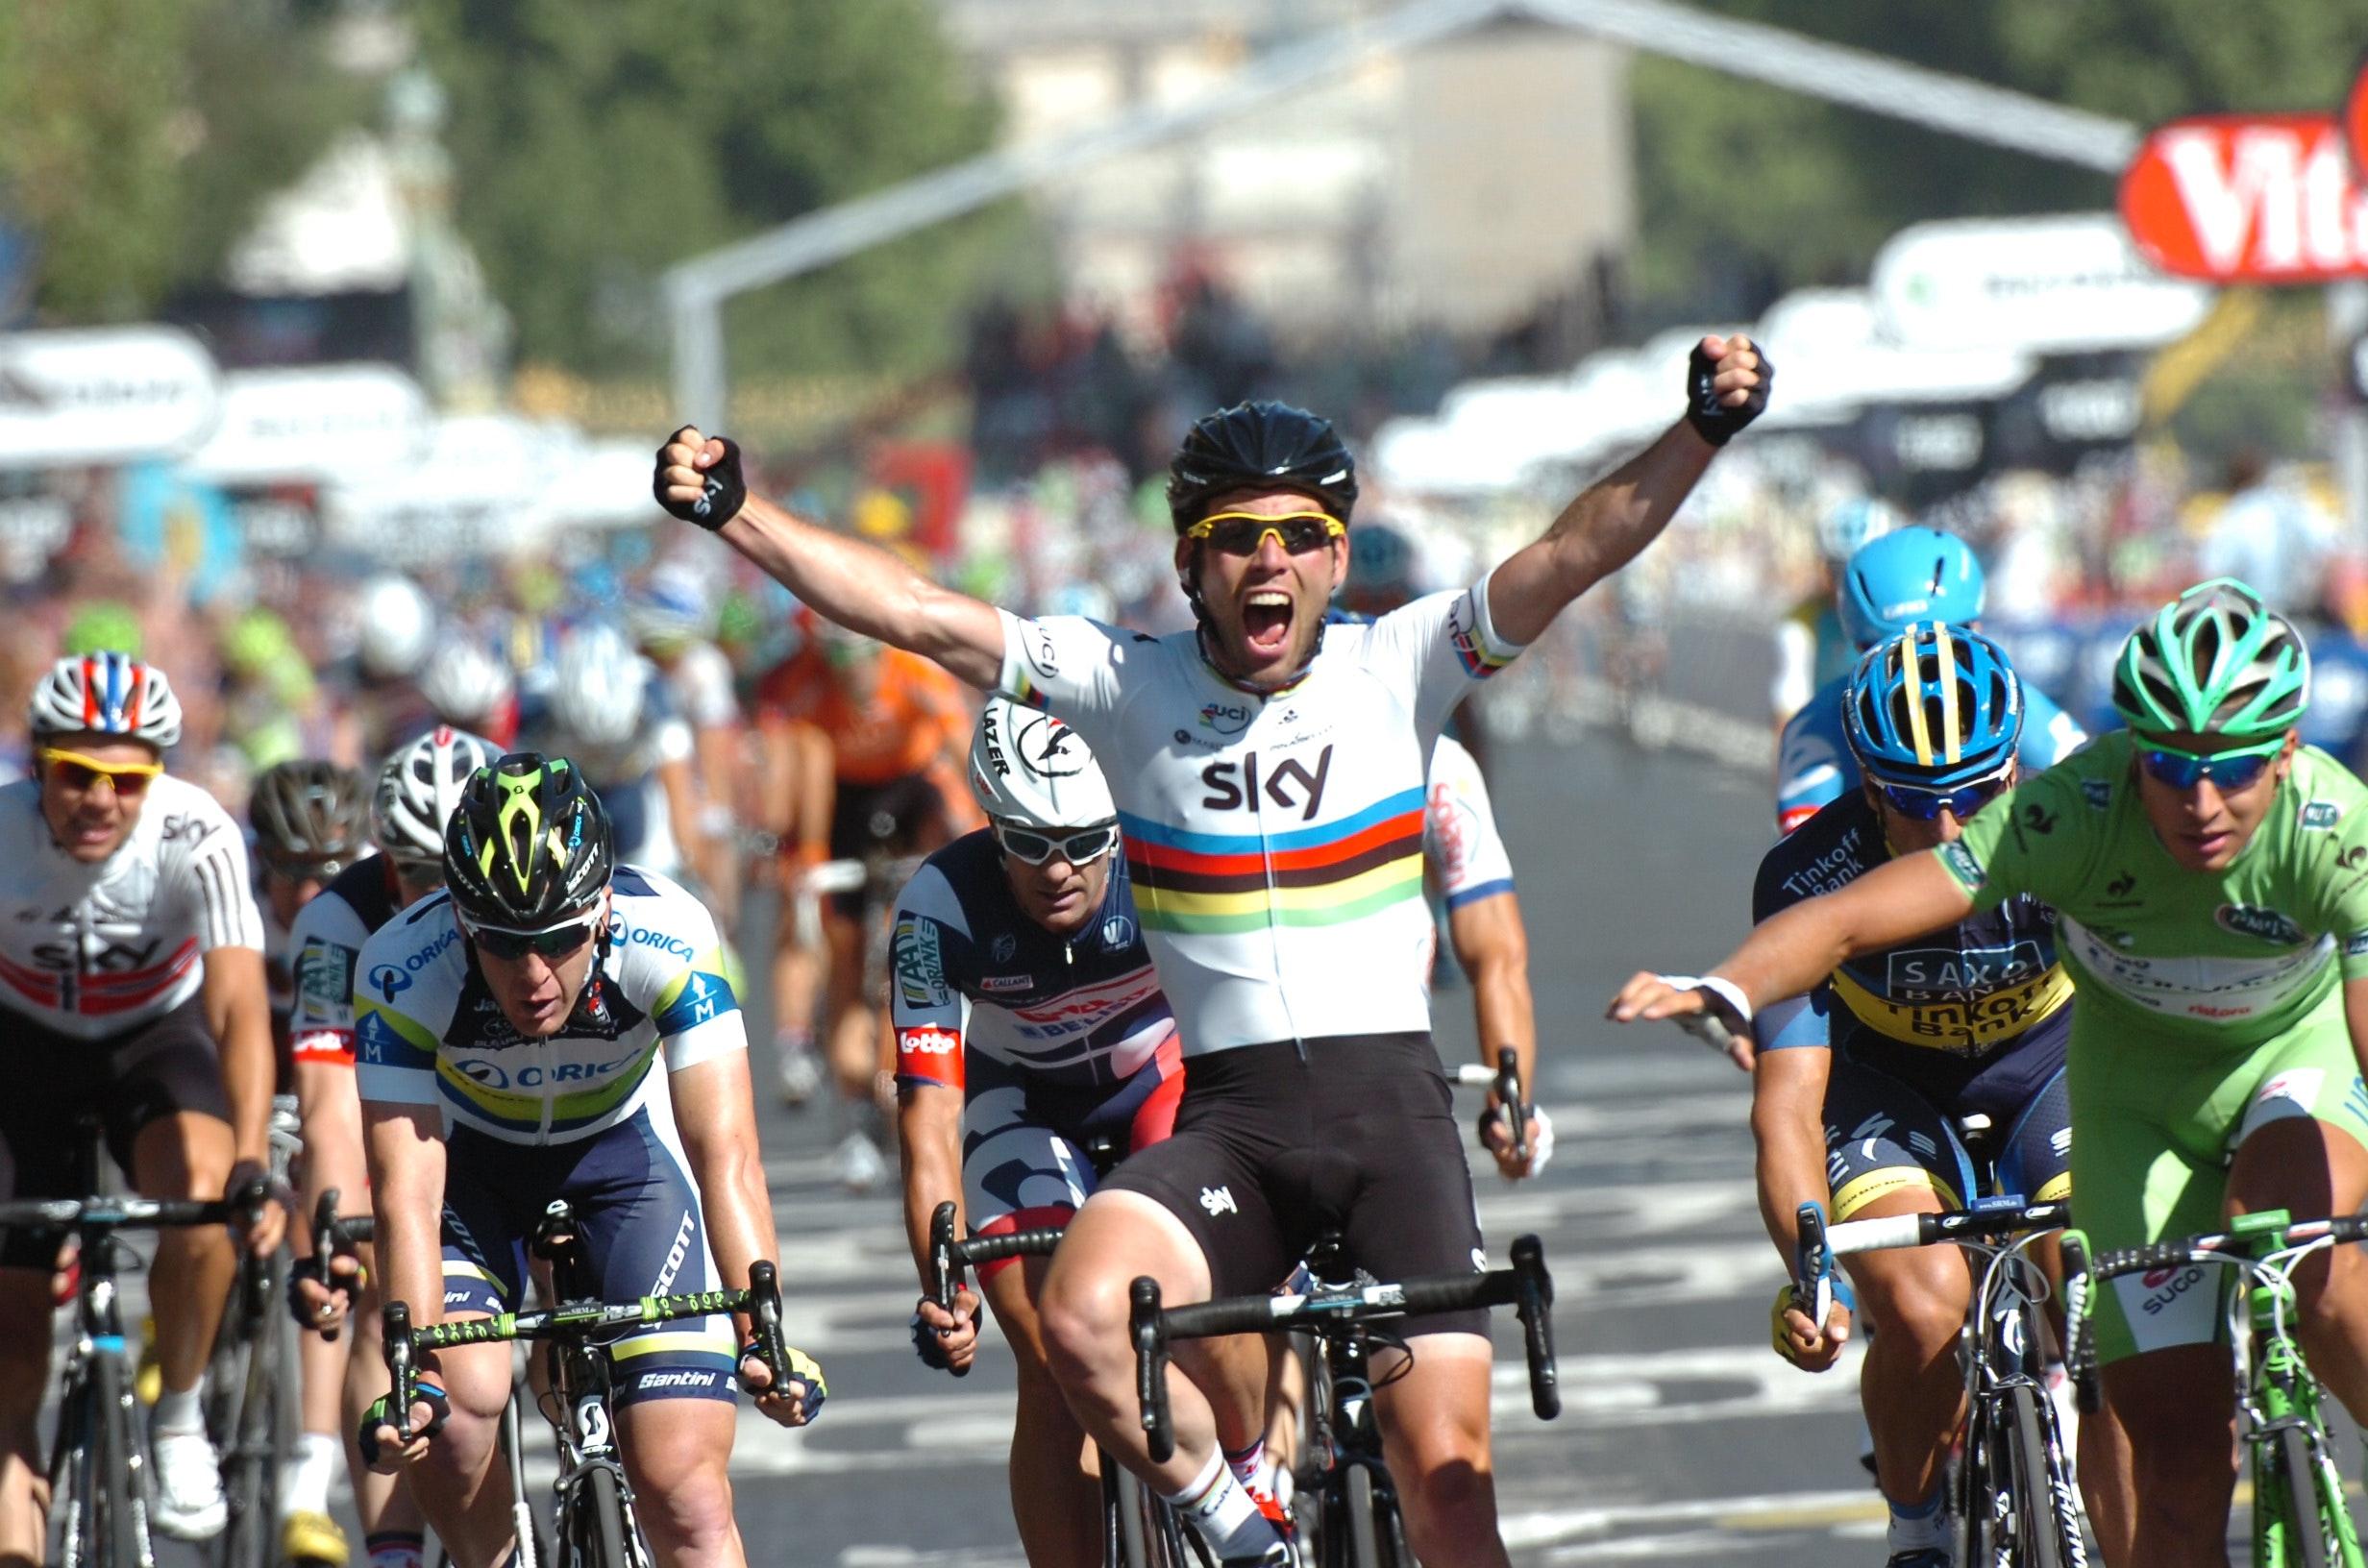 Mark Cavendish, 2012, Tour de France, world champion, Champs-Elysees, rainbow jersey, celebration, Paris, Team Sky, pic: (c) Stefano Sirotti